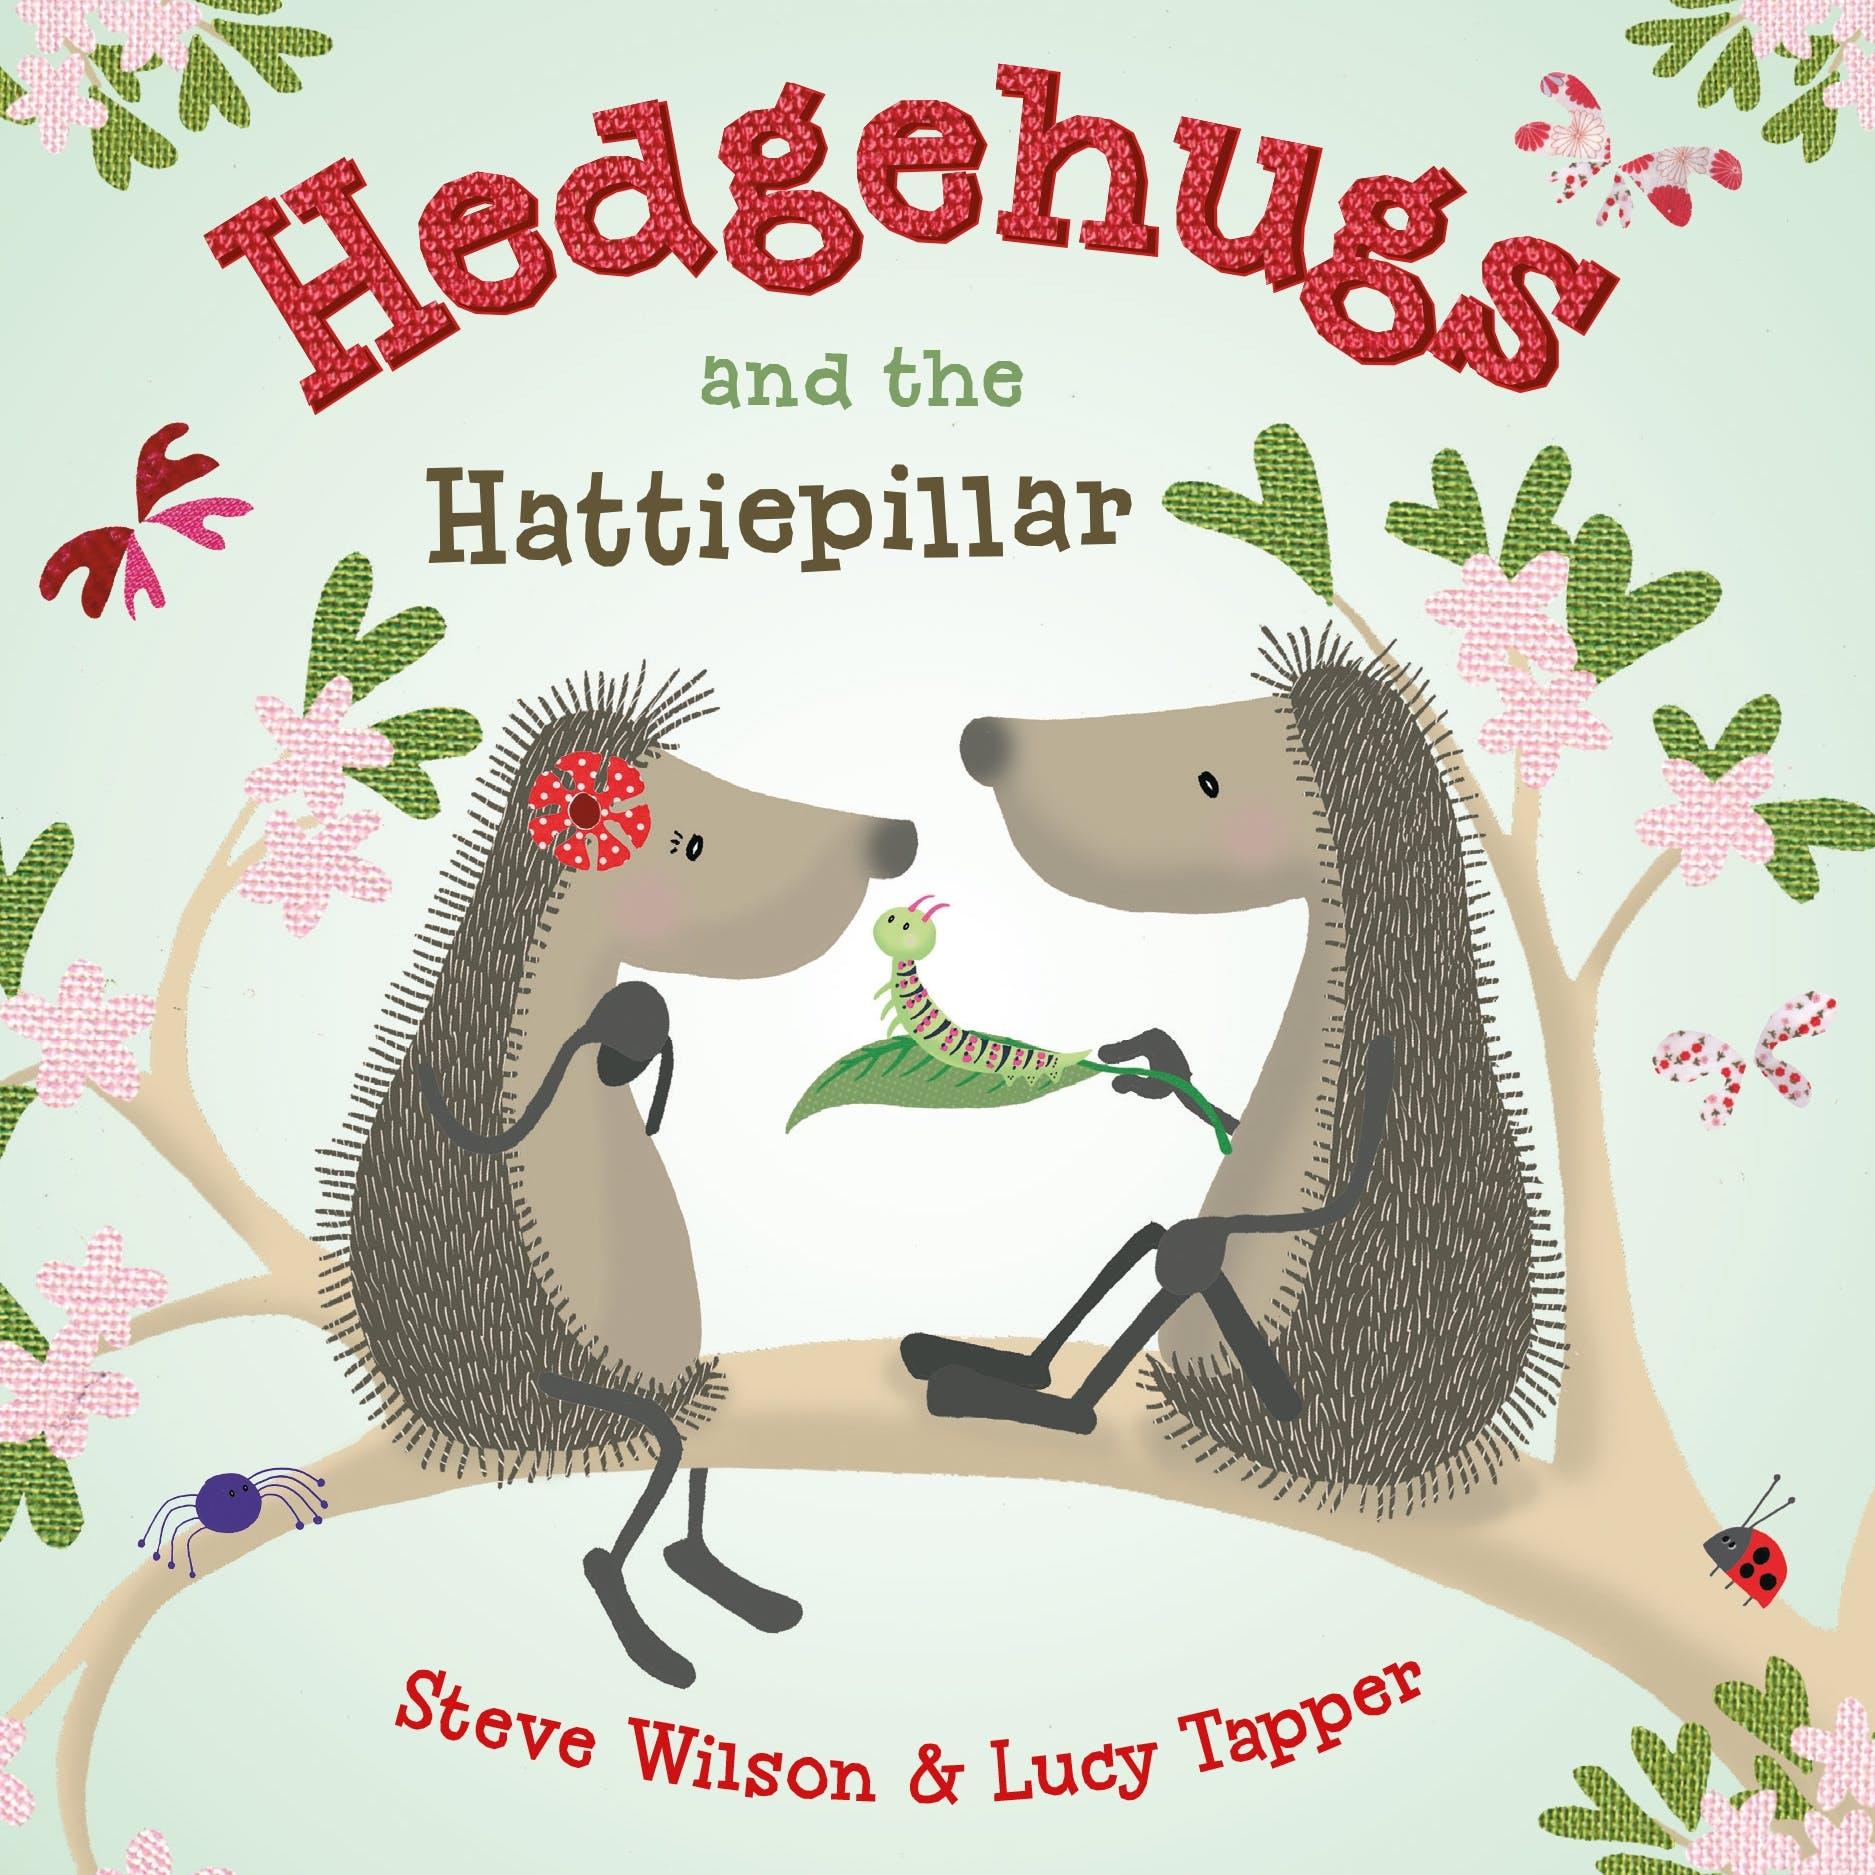 Image of Hedgehugs and the Hattiepillar